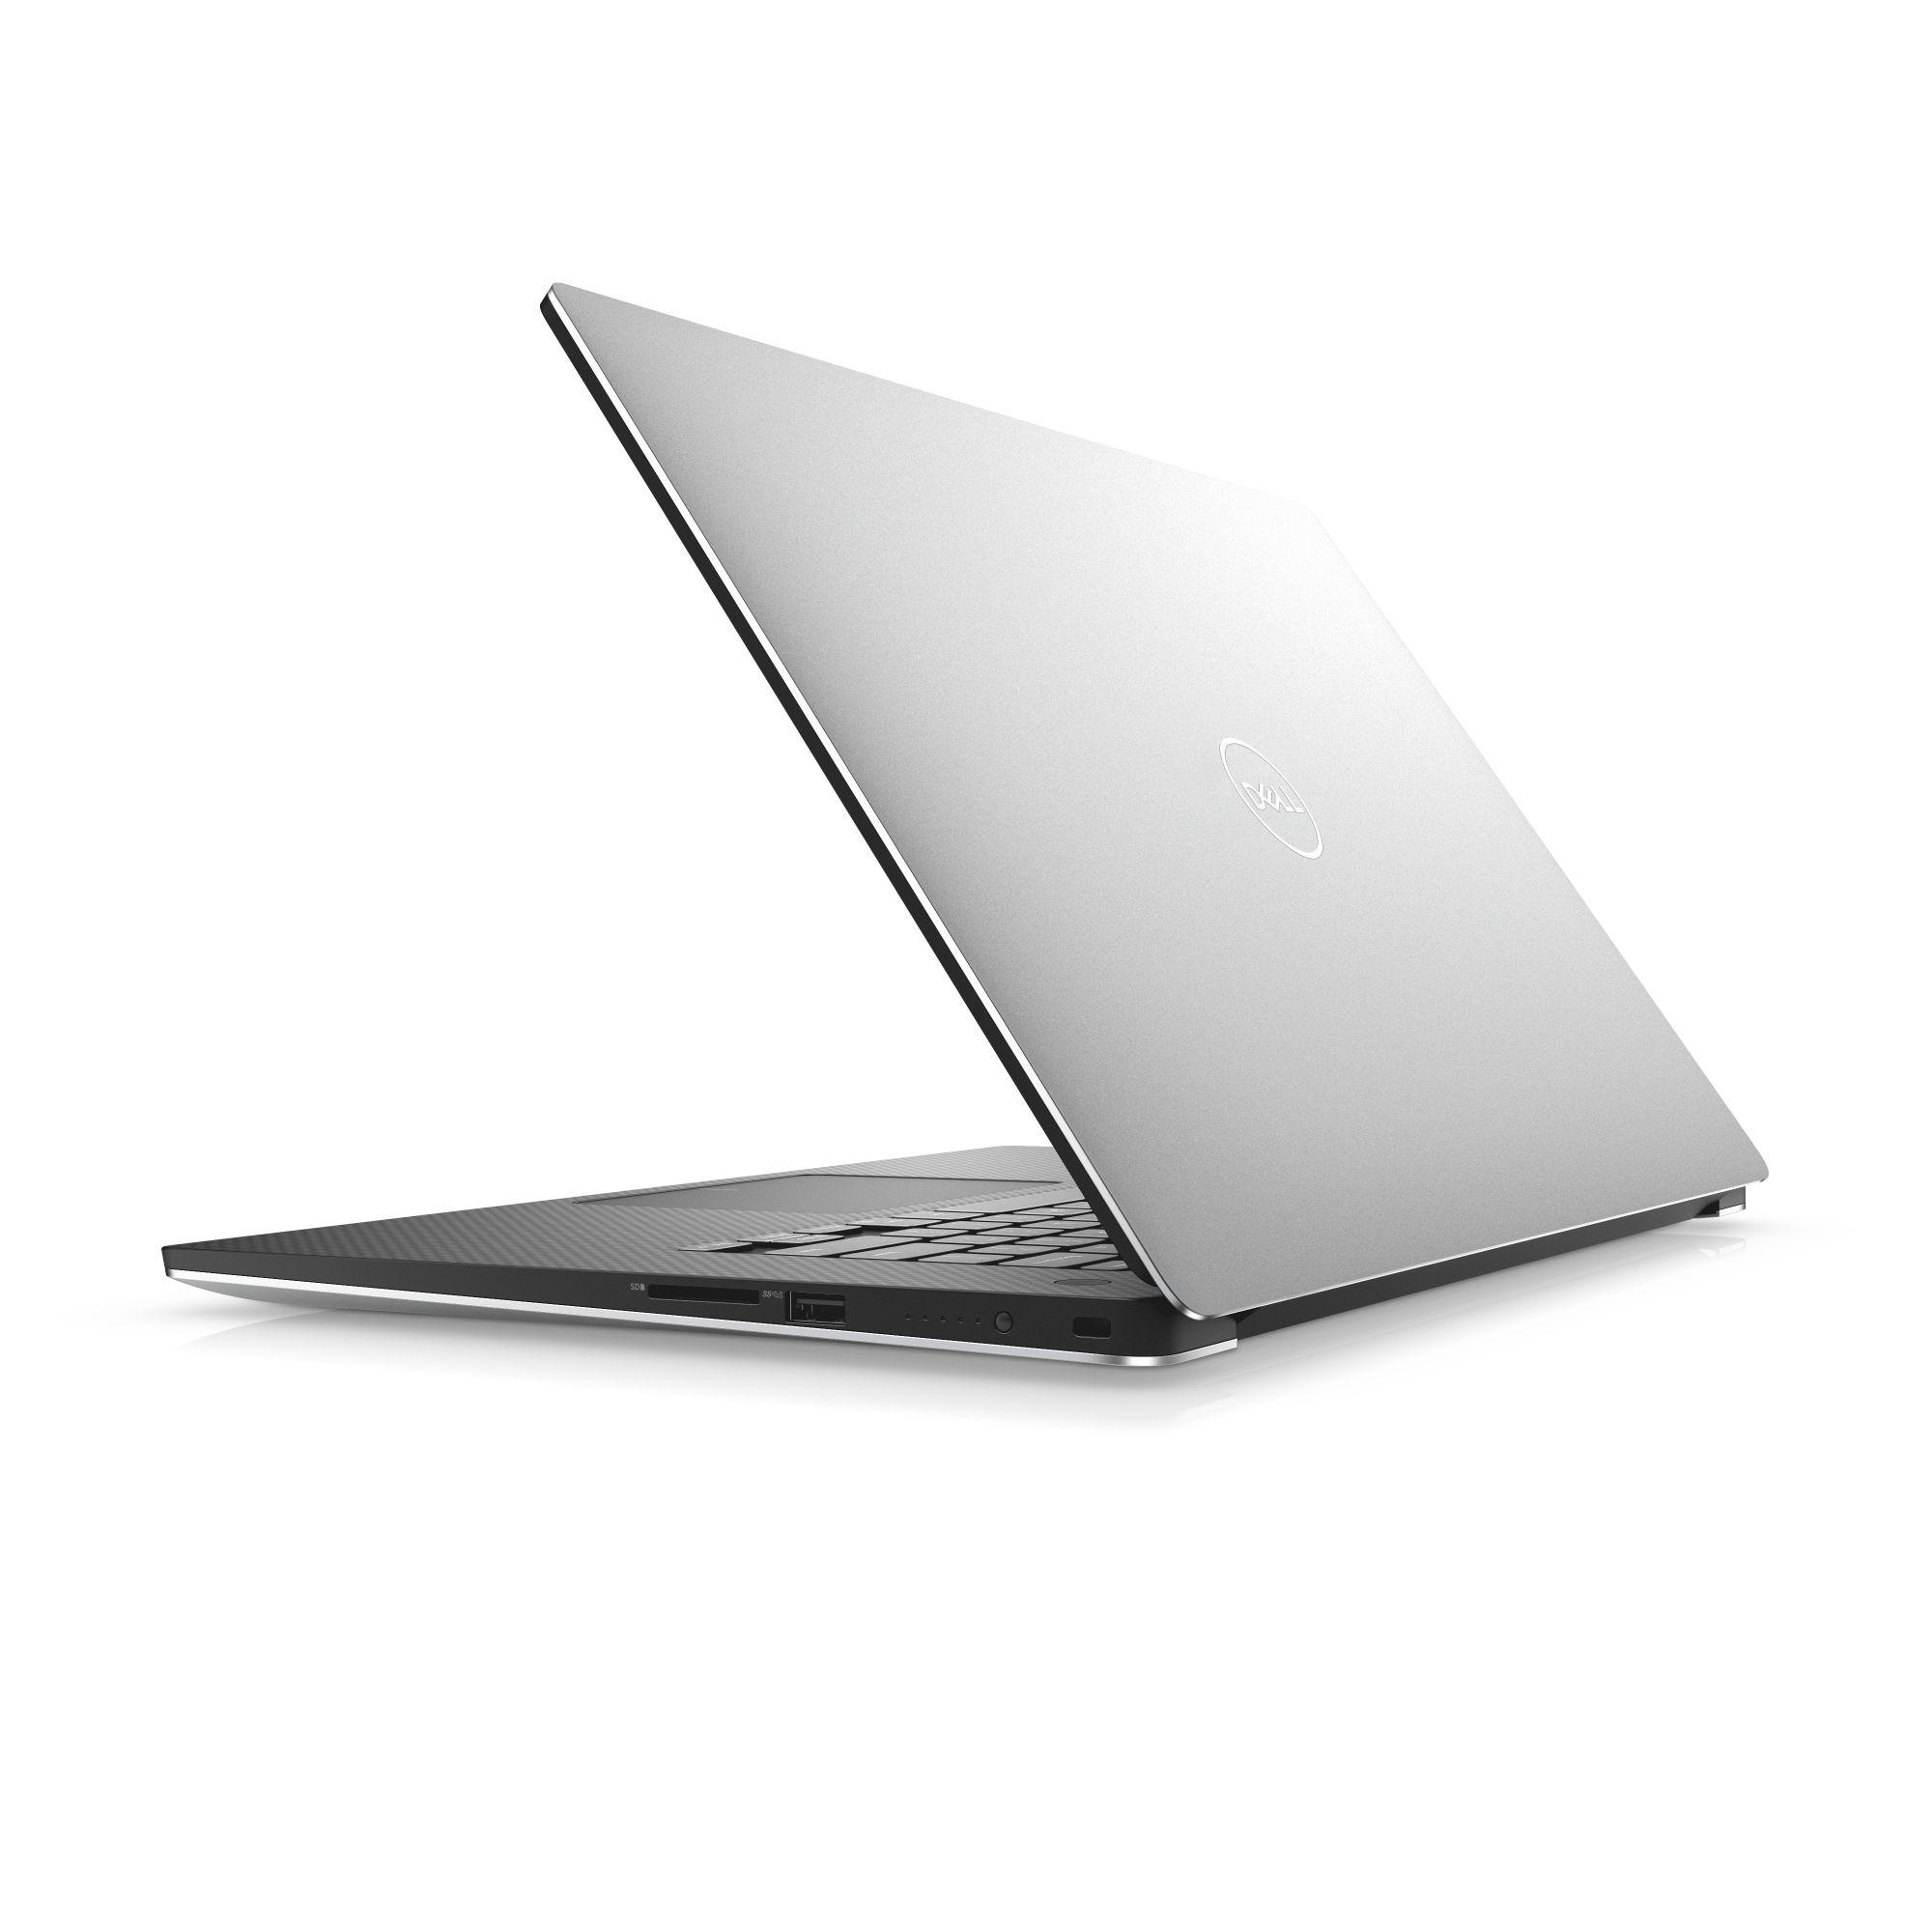 "Obrázok produktu Dell XPS 15 9570 15"" FHD i5-8300H/ 8GB/ 128GB SSD+1TB/ GTX1050-4GB/ THB/ MCR/ FPR/ W10/ 2RNBD/"